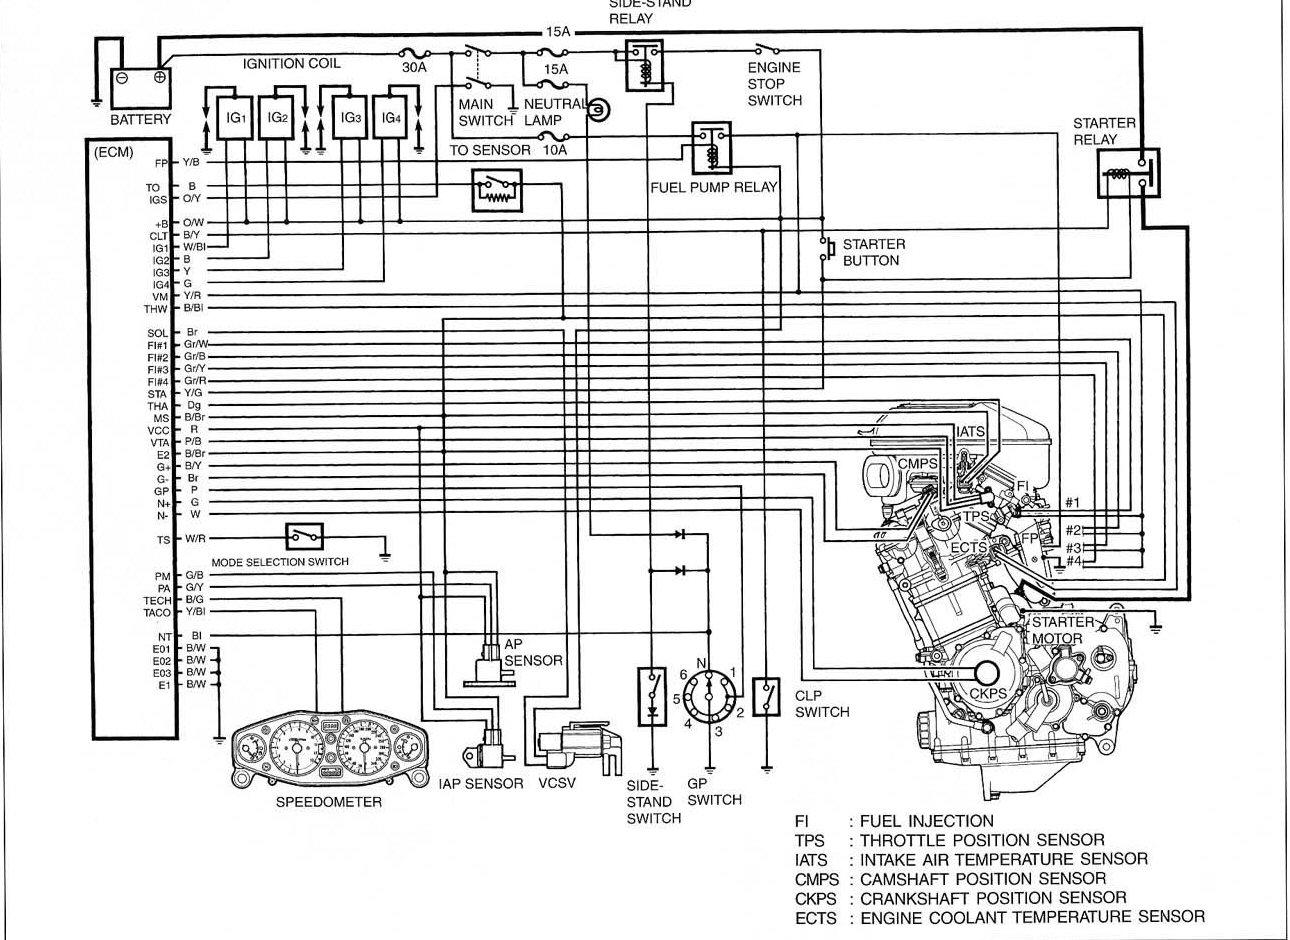 hight resolution of 2007 hayabusa wiring diagram electrical wiring diagram house u2022 thomas bus engine diagram busa engine